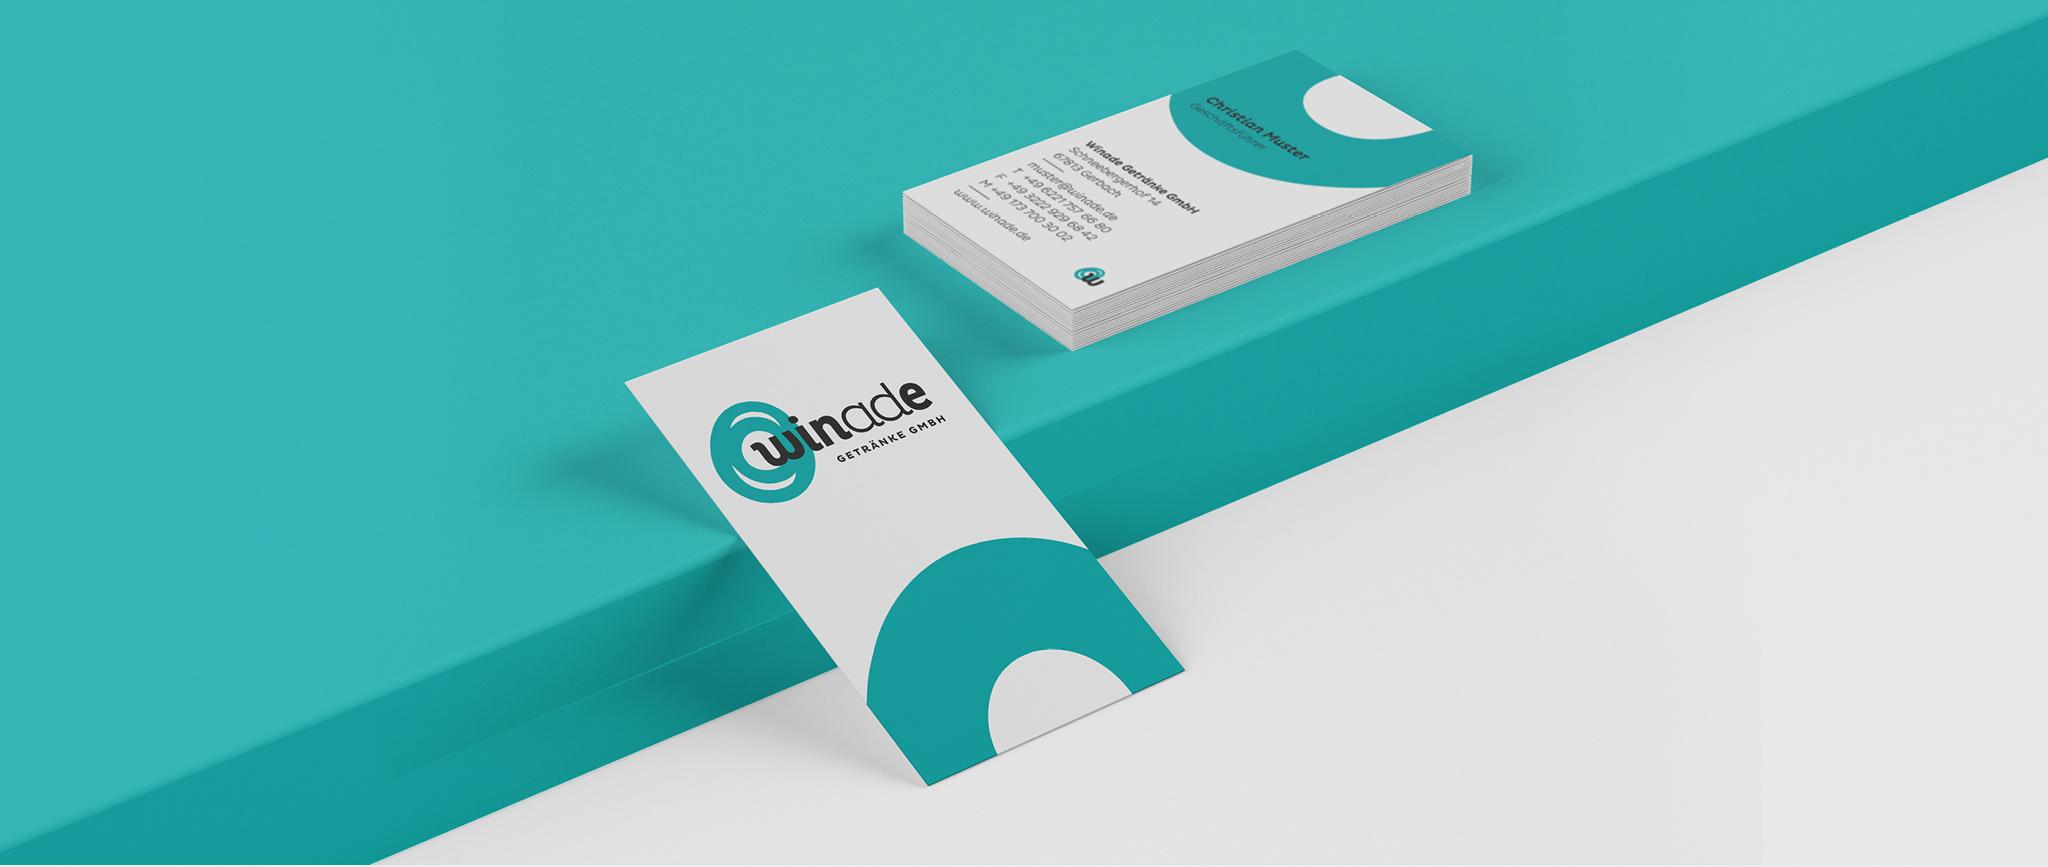 Winade Markenentwicklung: Stationary Visitenkarten